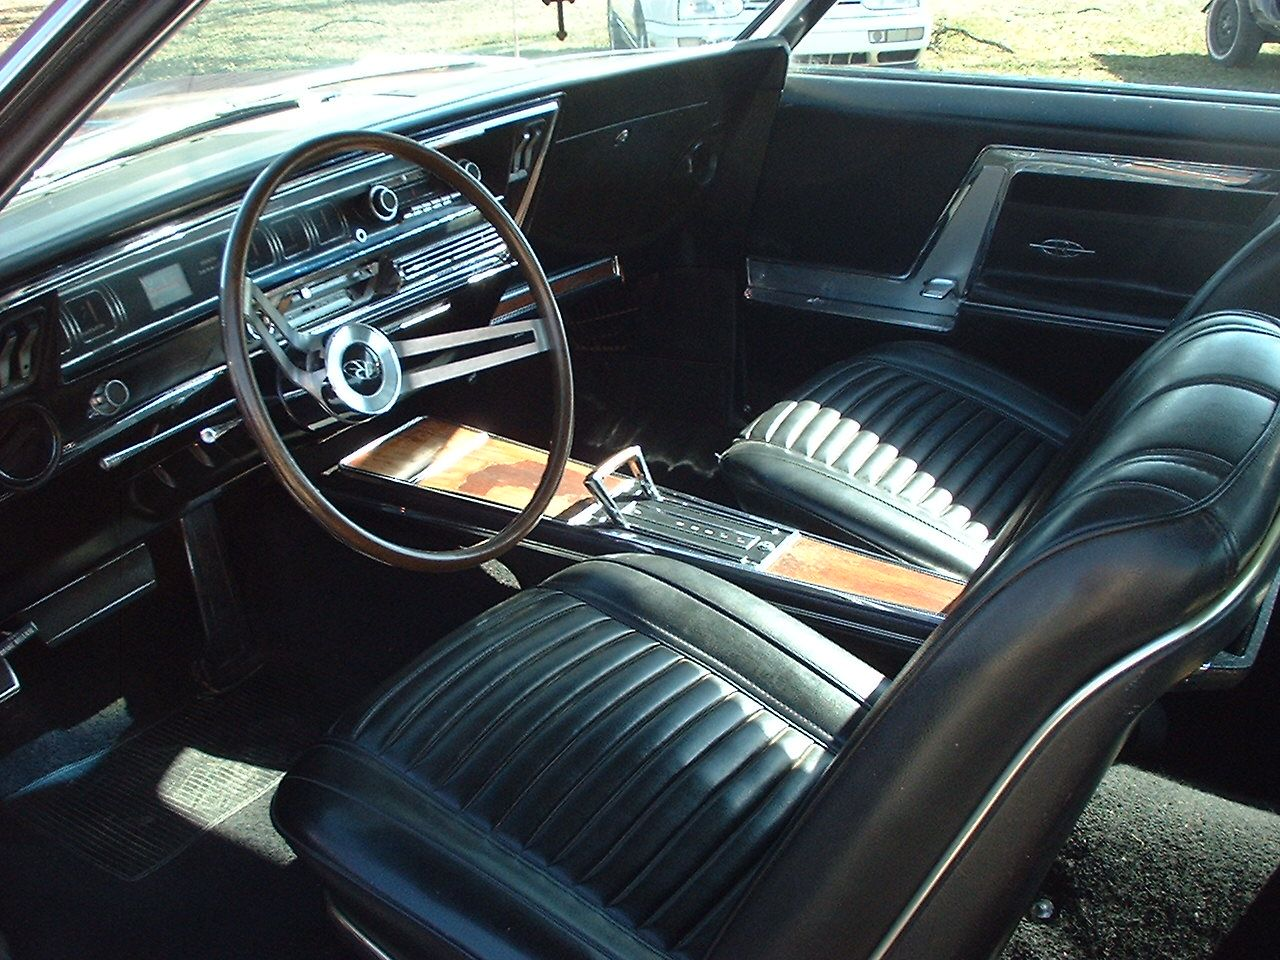 1966 Riviera Interior Buick Riviera Luxury Car Interior 1965 Buick Riviera